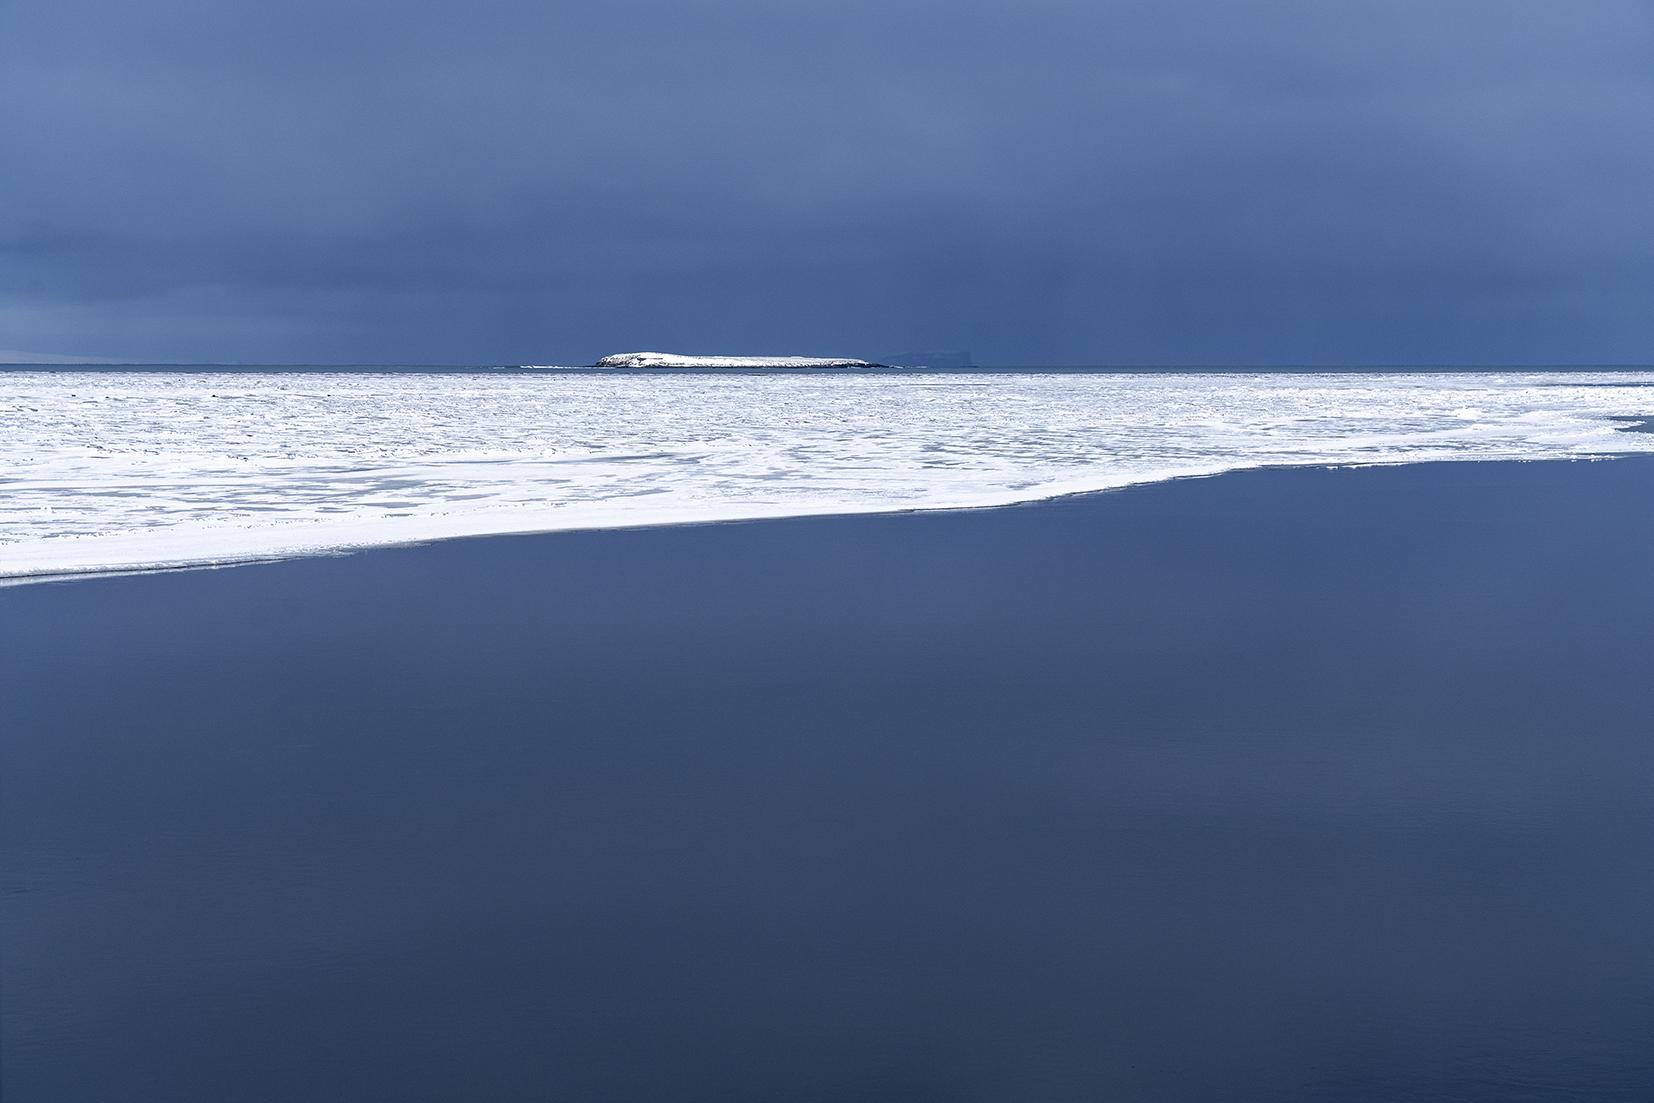 Skagafjördur banquise mer plaque de glace